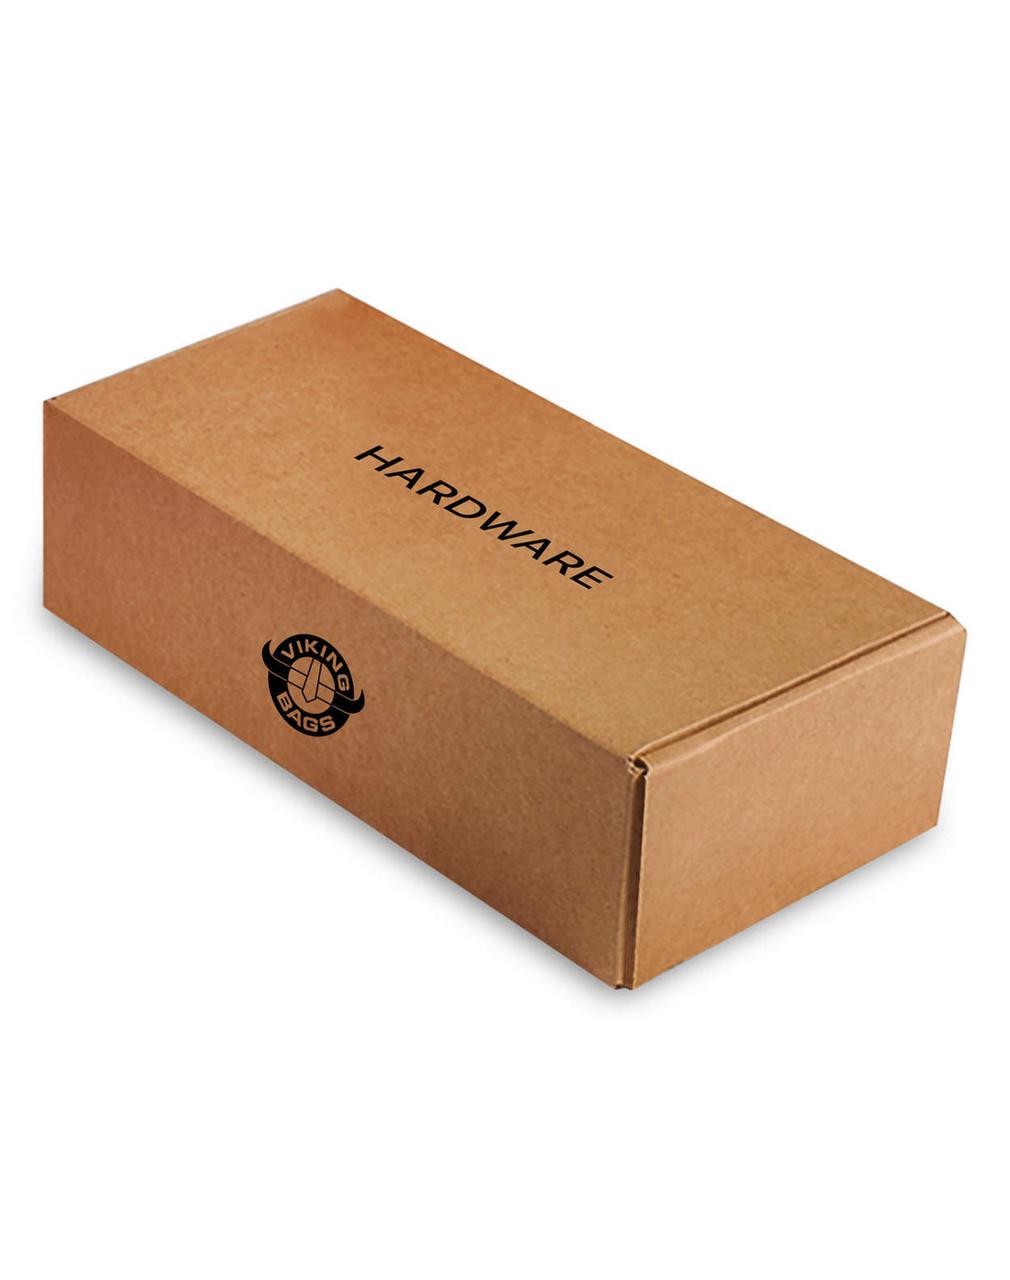 Honda Rebel 500 Shock Cutout Studded Motorcycle Saddlebags Hardware Box